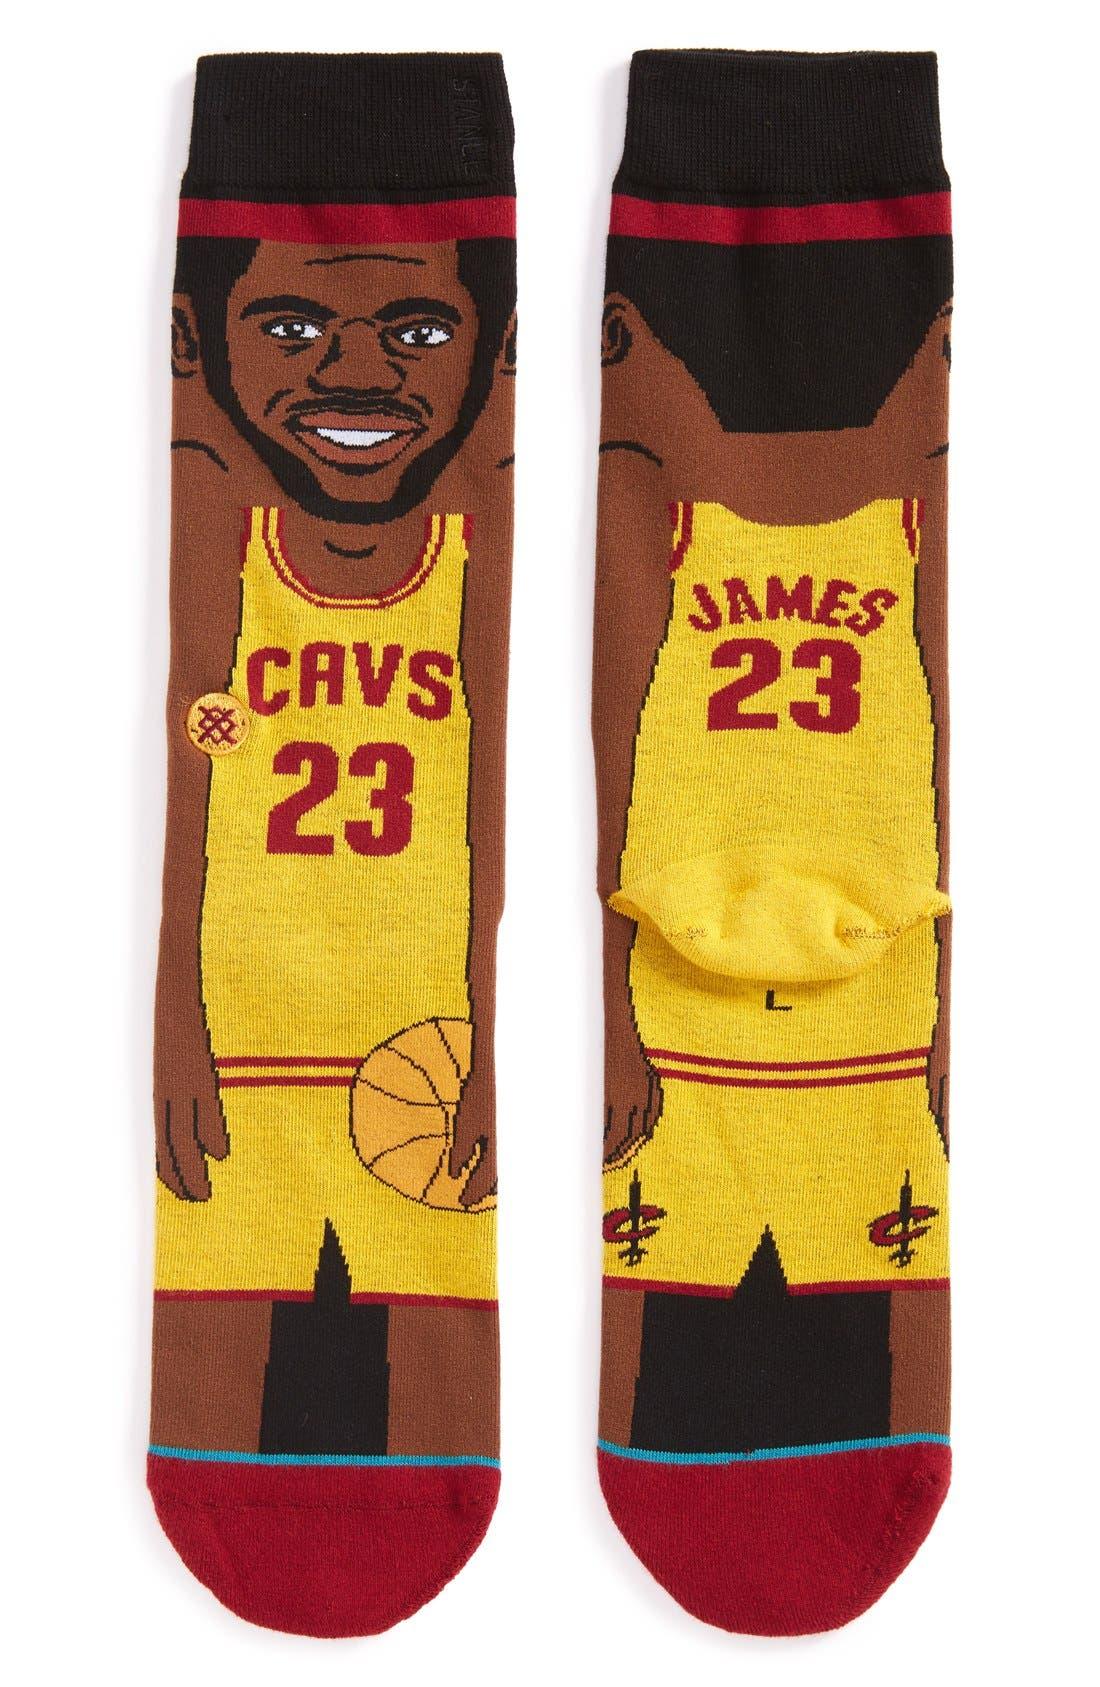 Main Image - Stance 'NBA Legends - LeBron James' Crew Socks